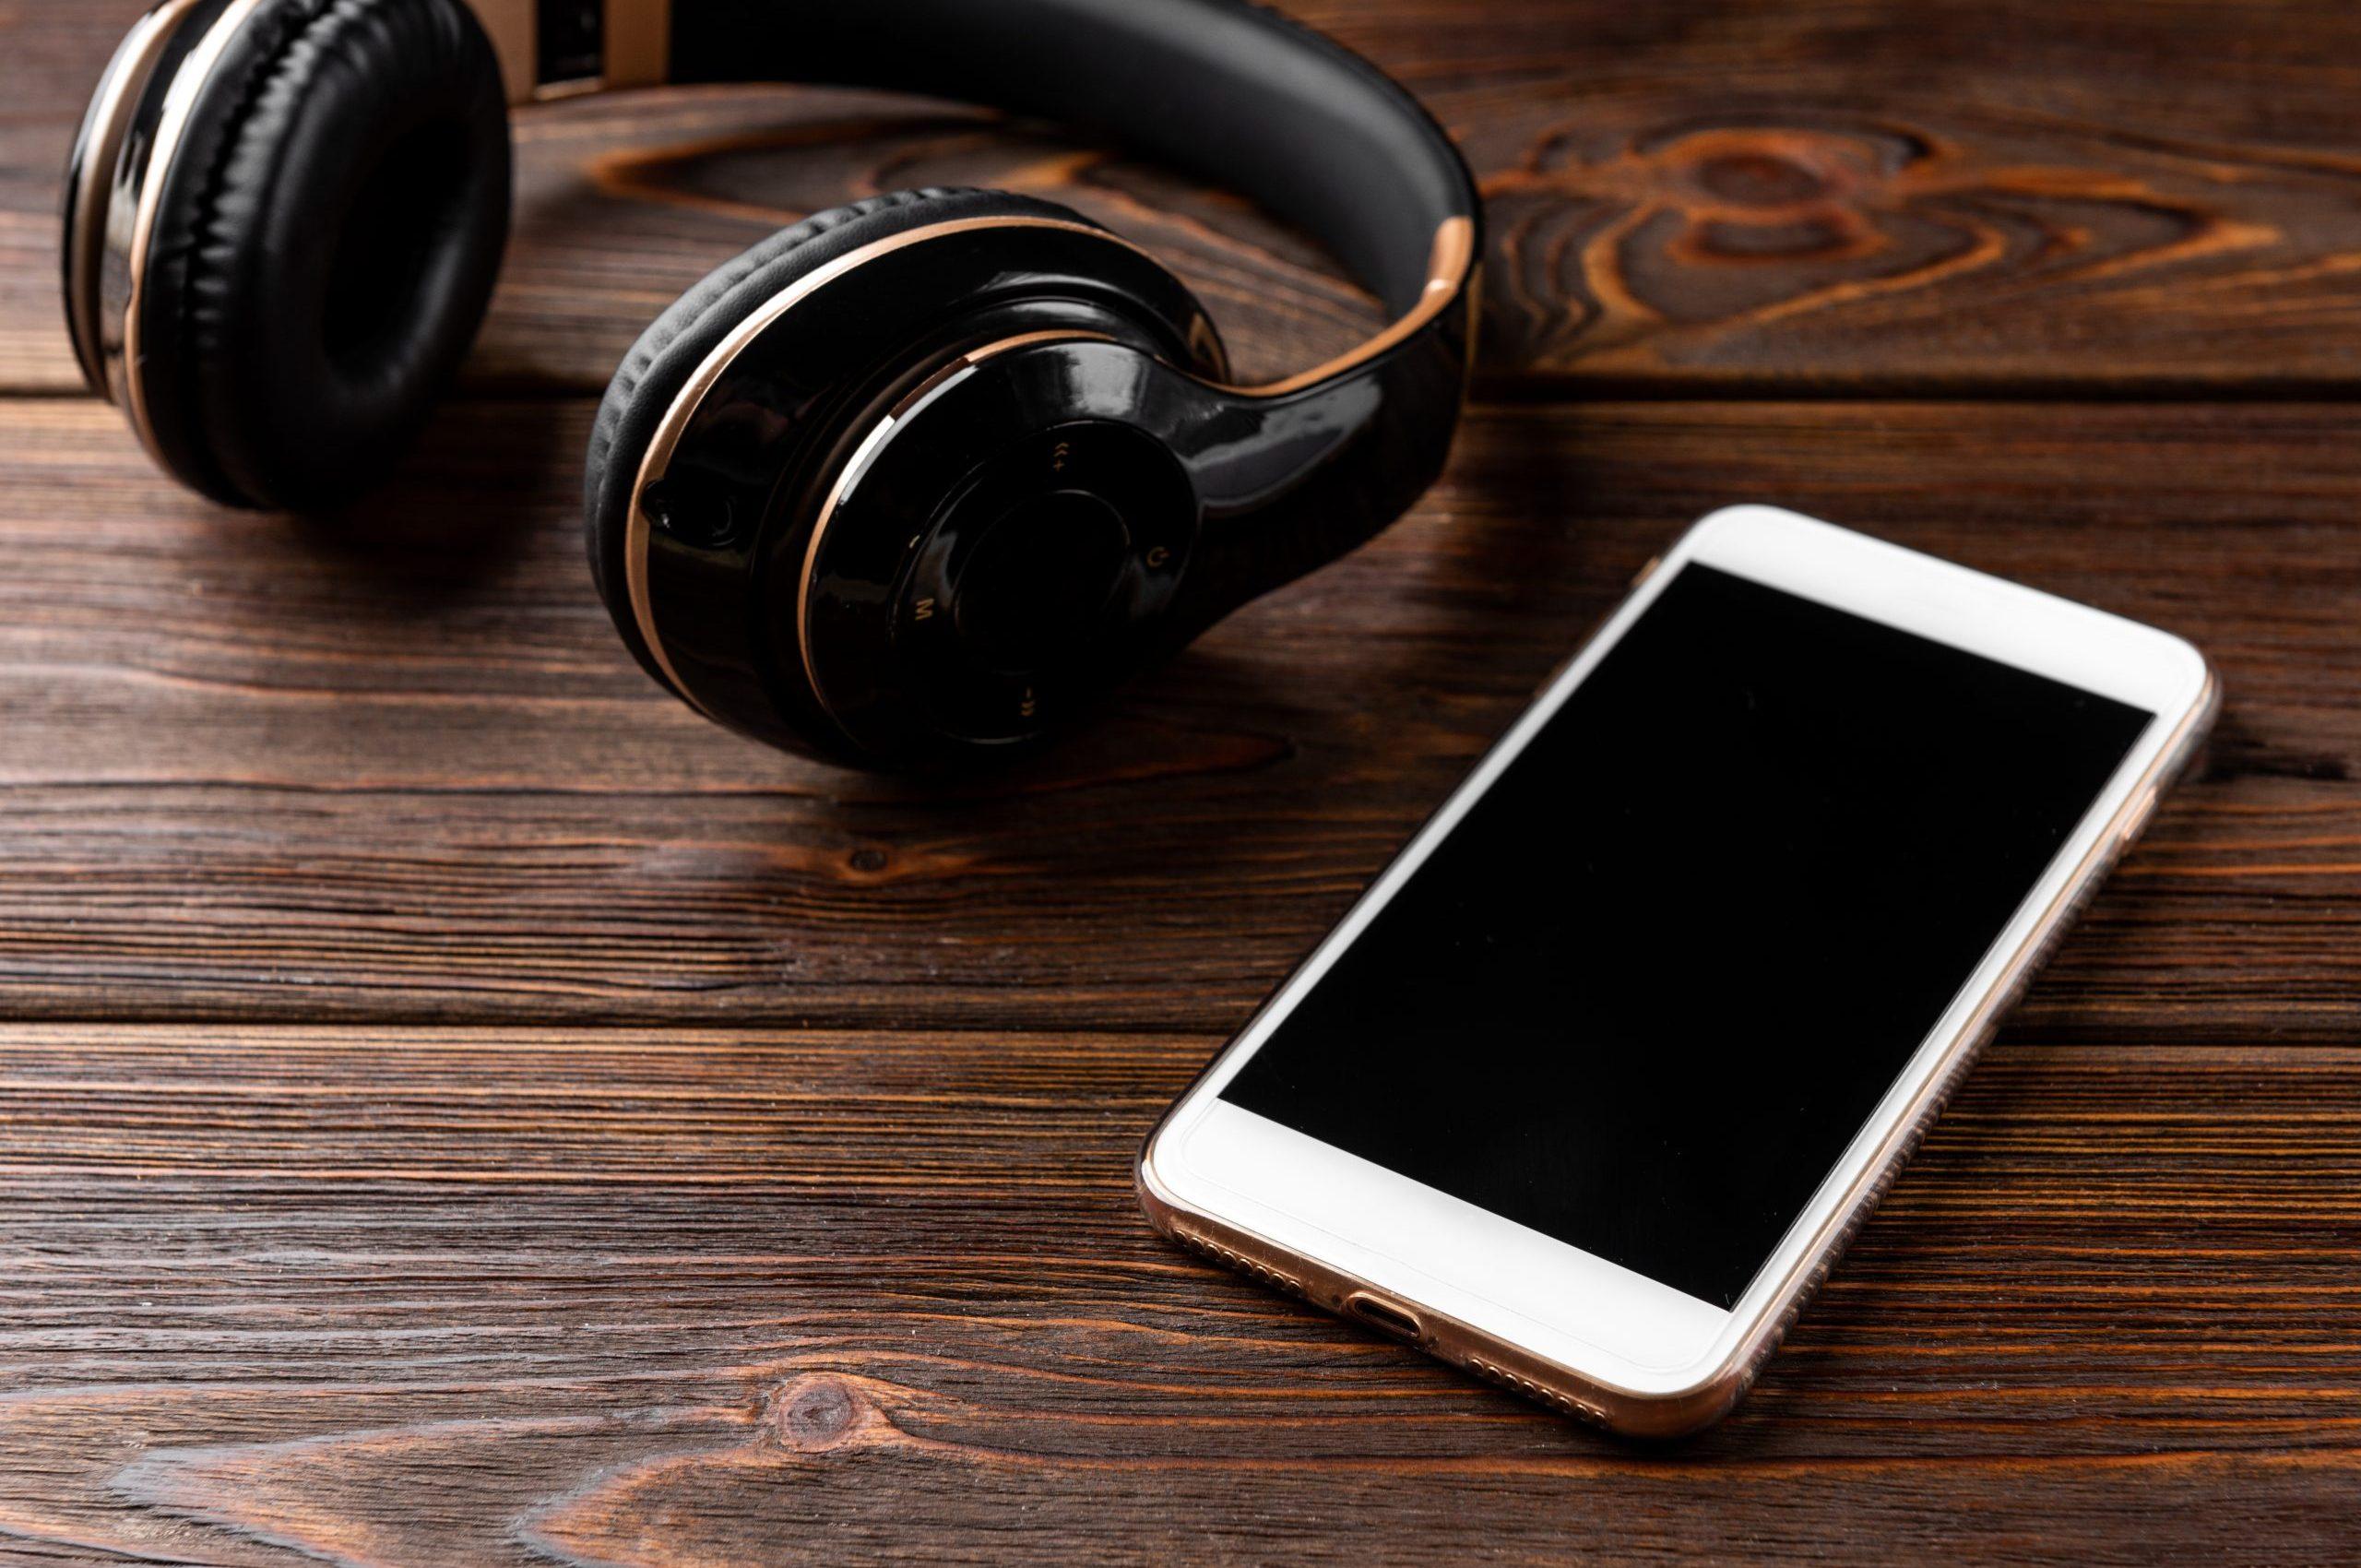 rmda-ss-retail-phone-headphones-wooden-background.6016.4016